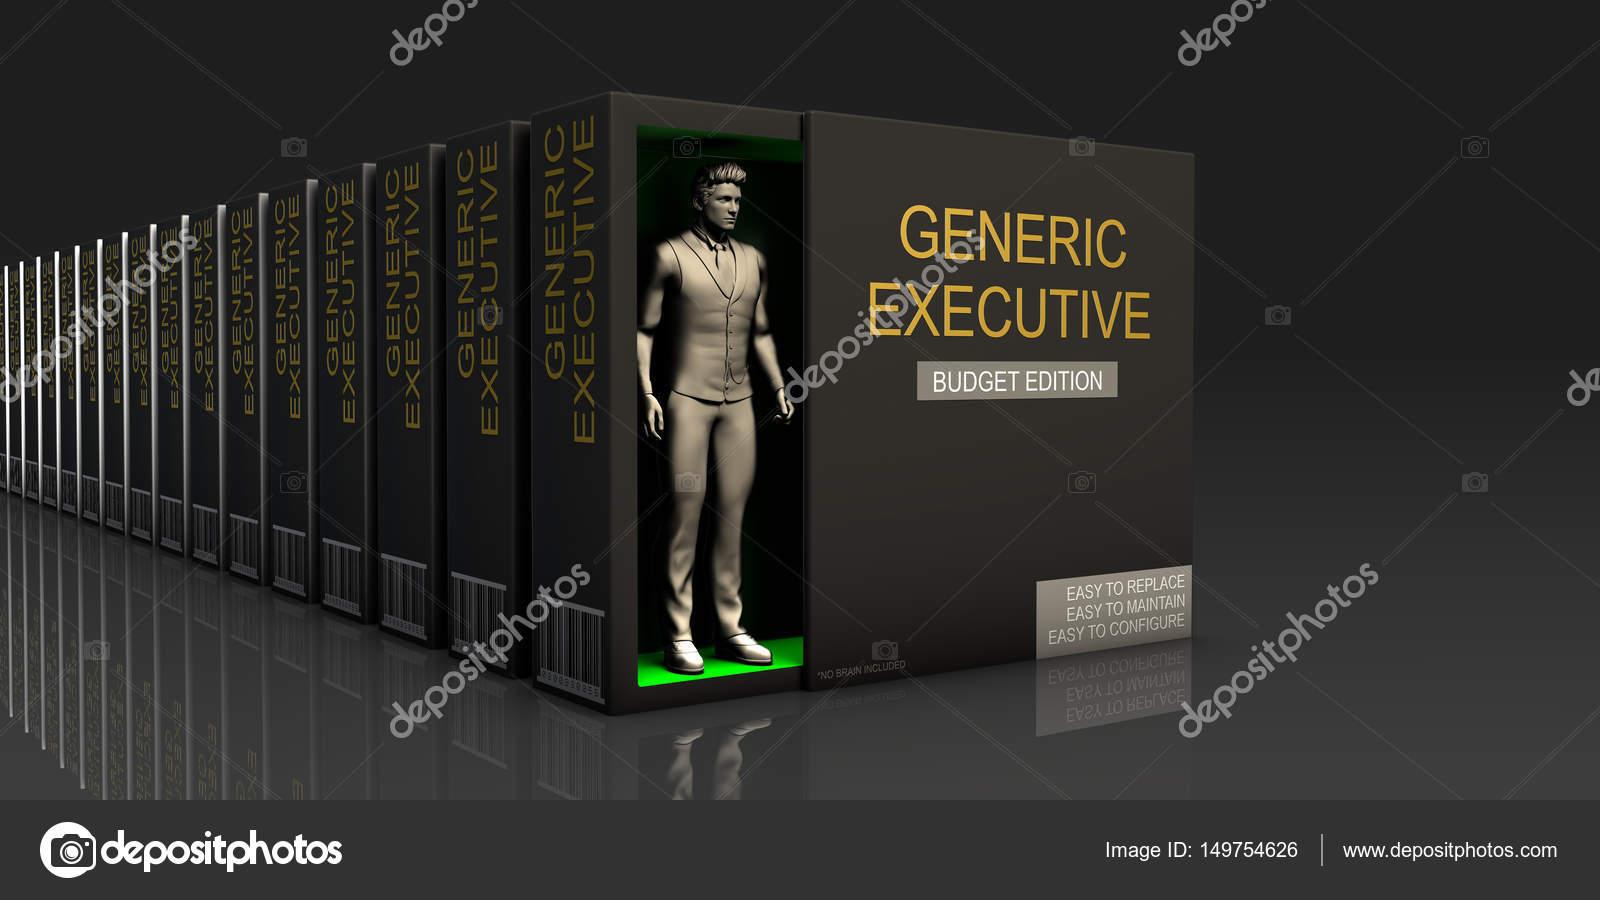 depositphotos_149754626-stock-photo-gene